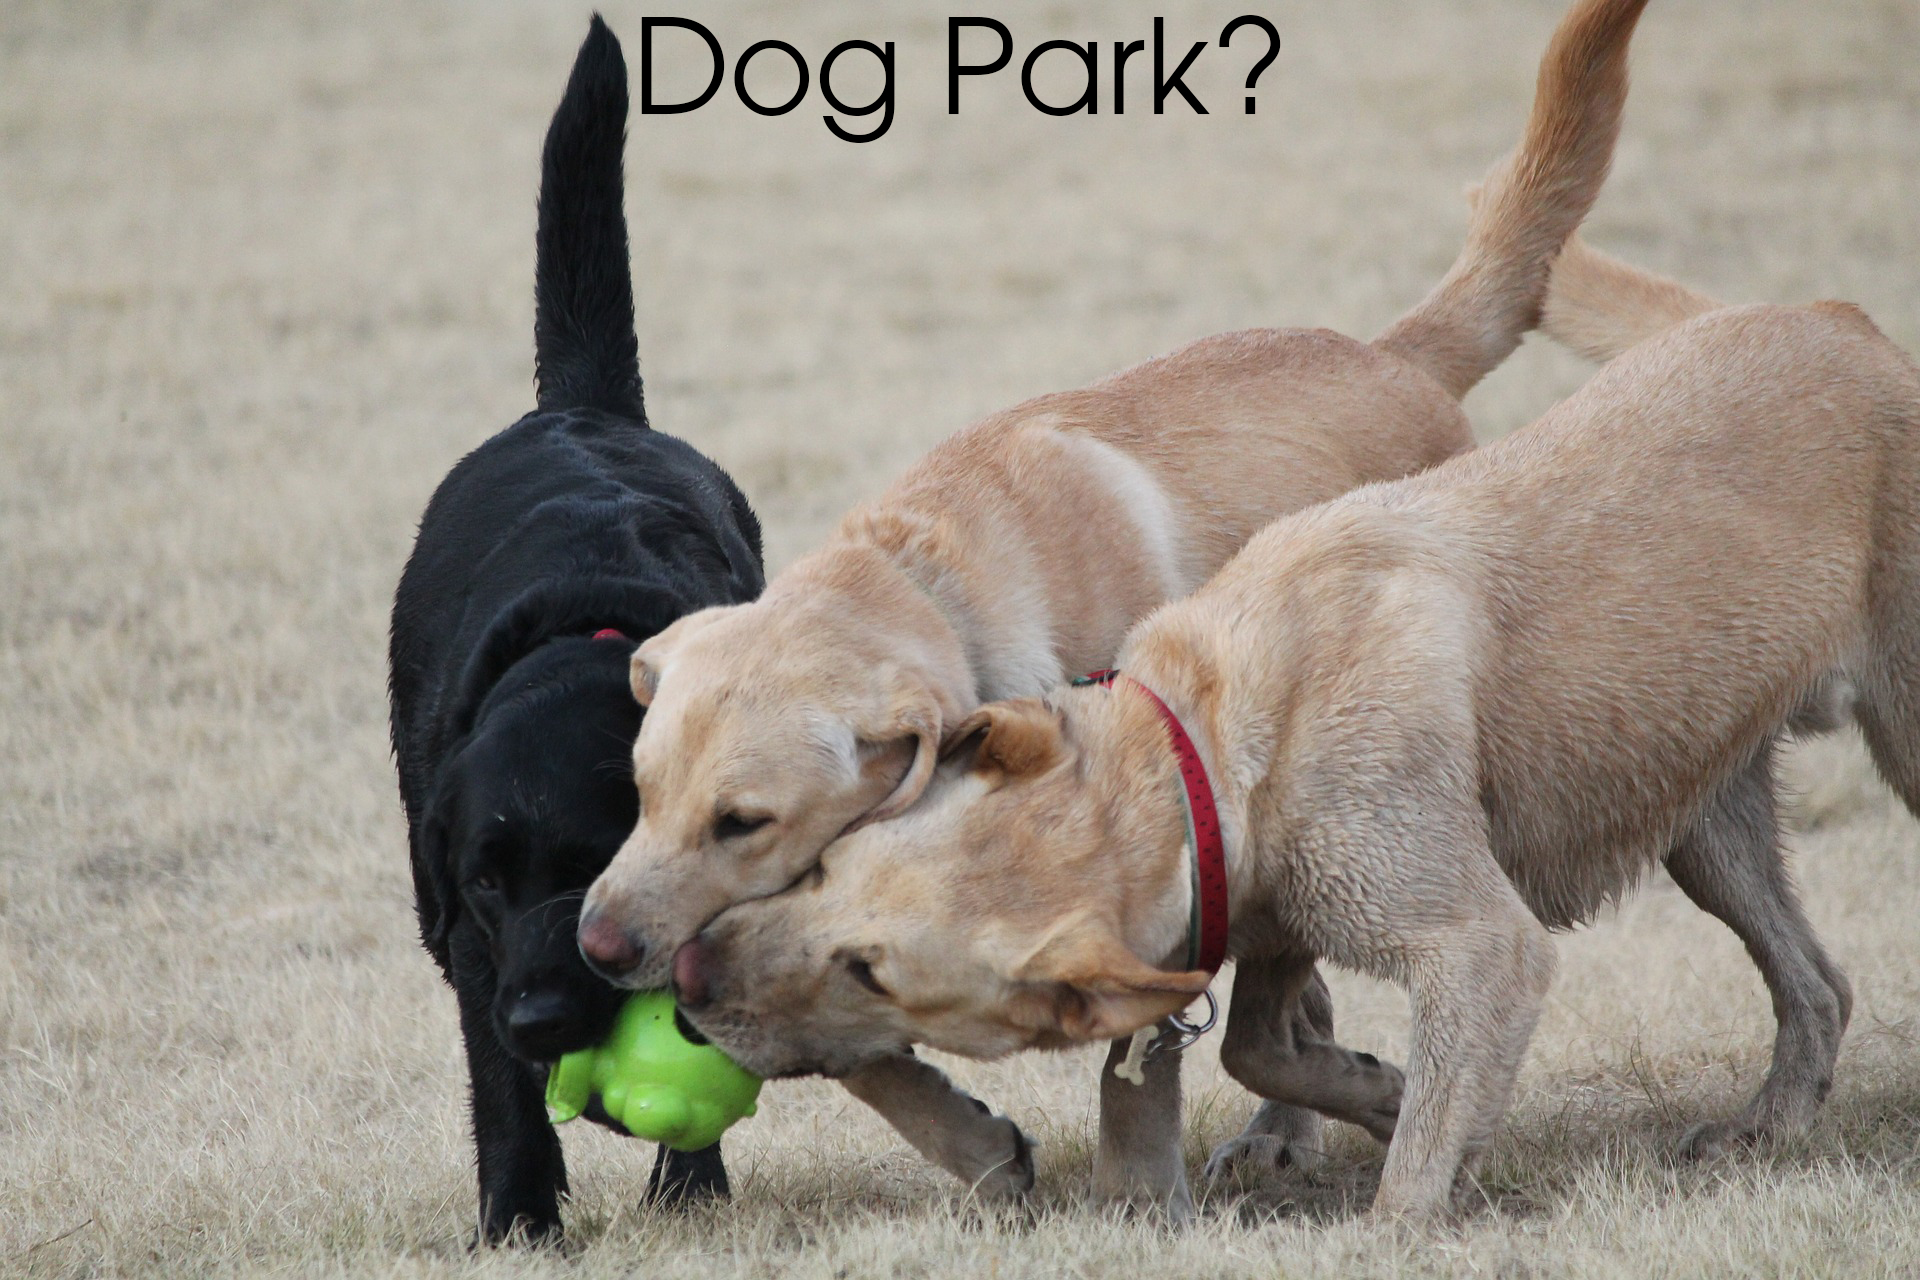 dogs-2690582_1920_1515165828463.jpg